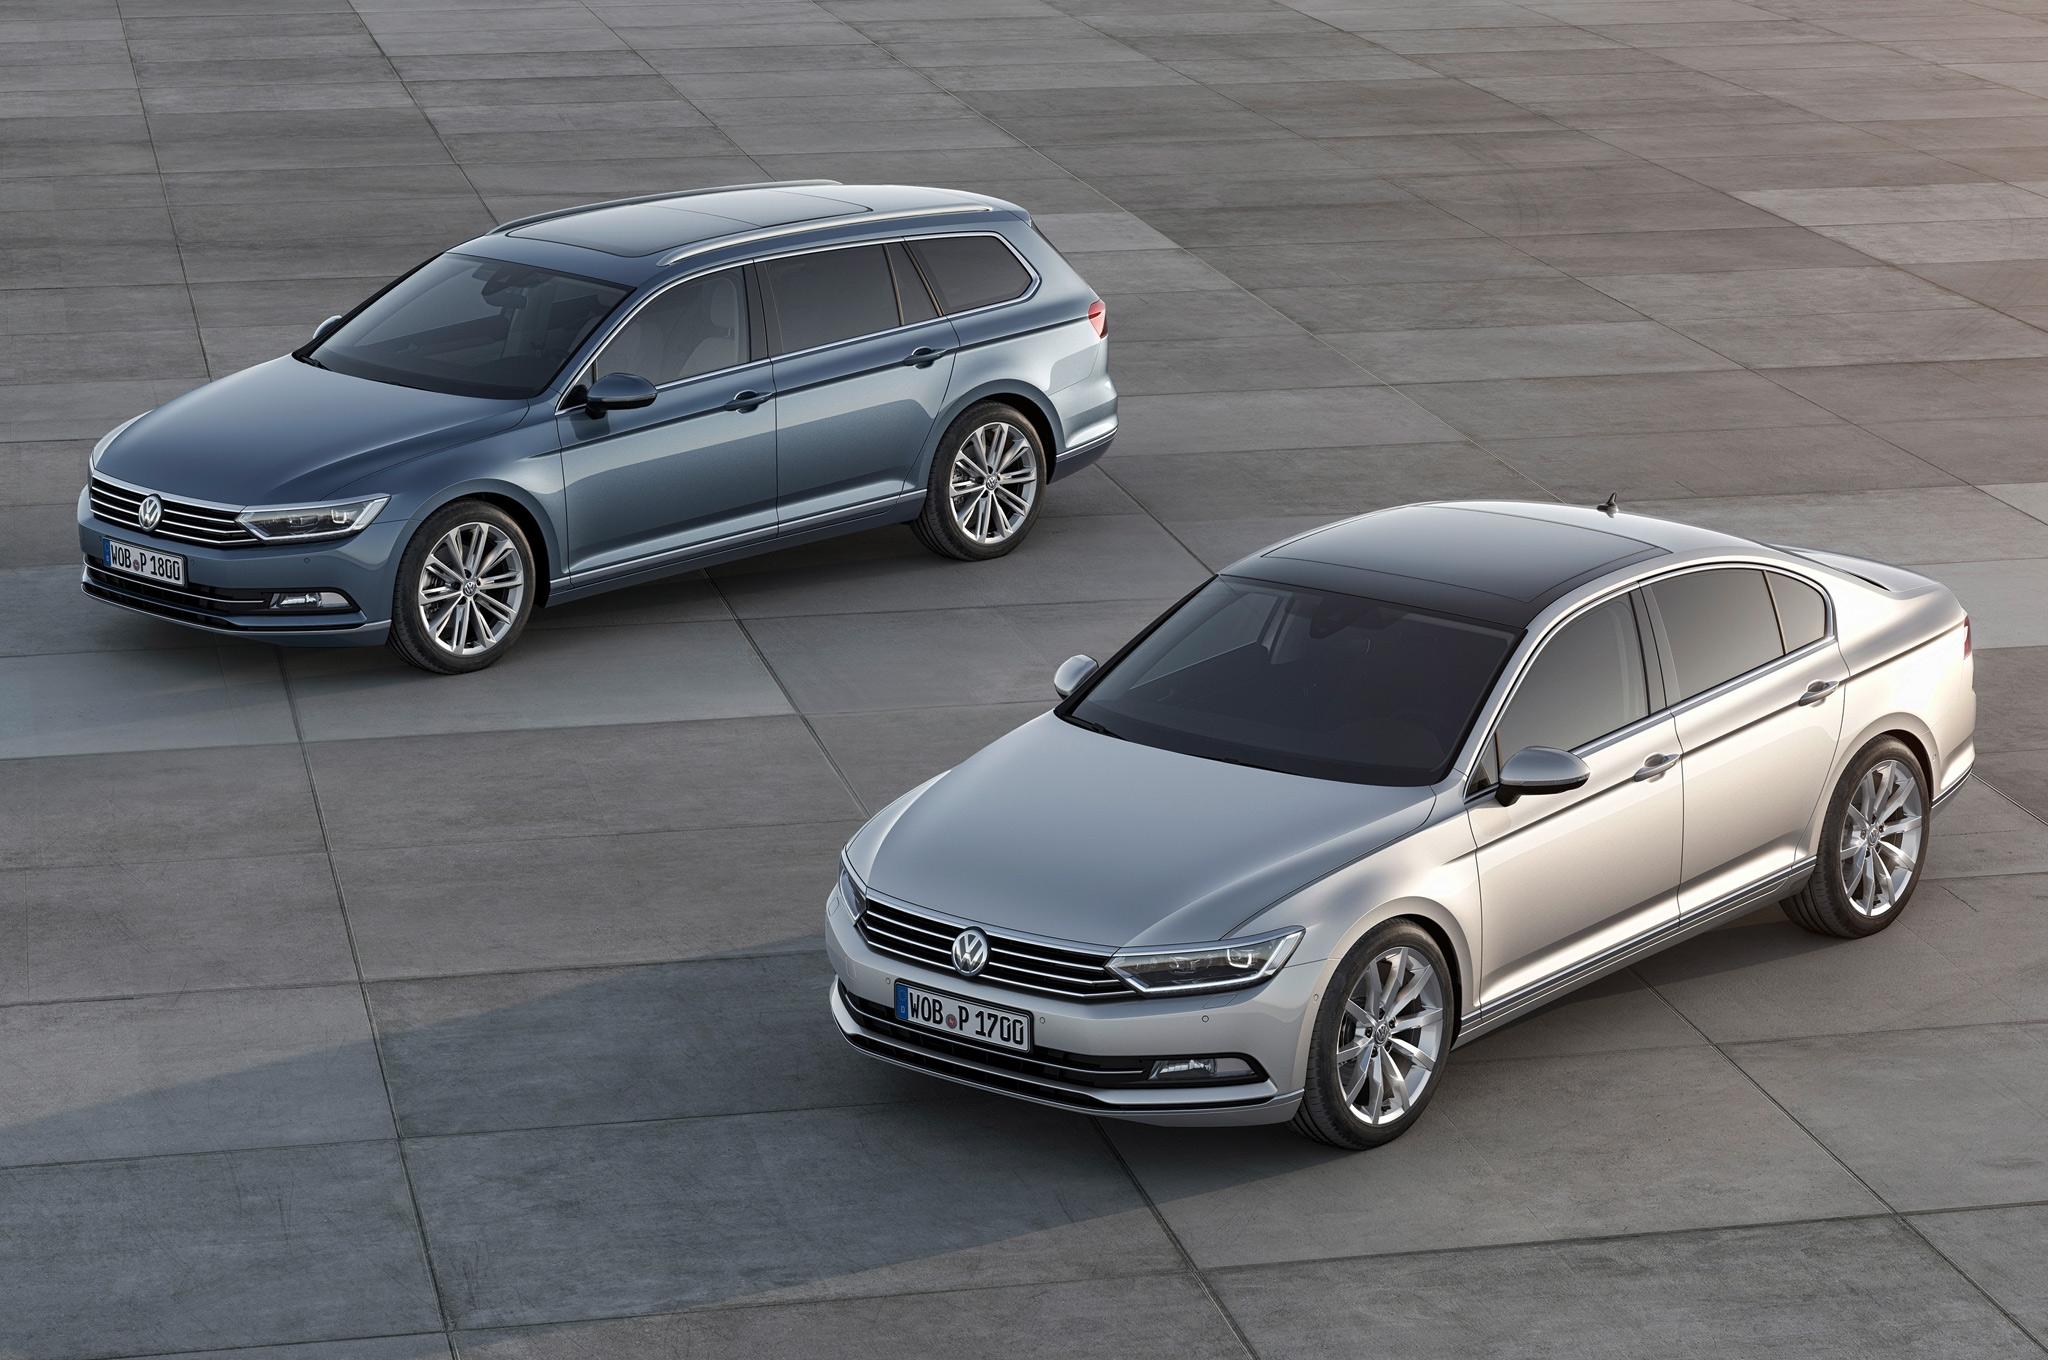 2015-volkswagen-passat-euro-spec-sedan-and-wagon.jpg